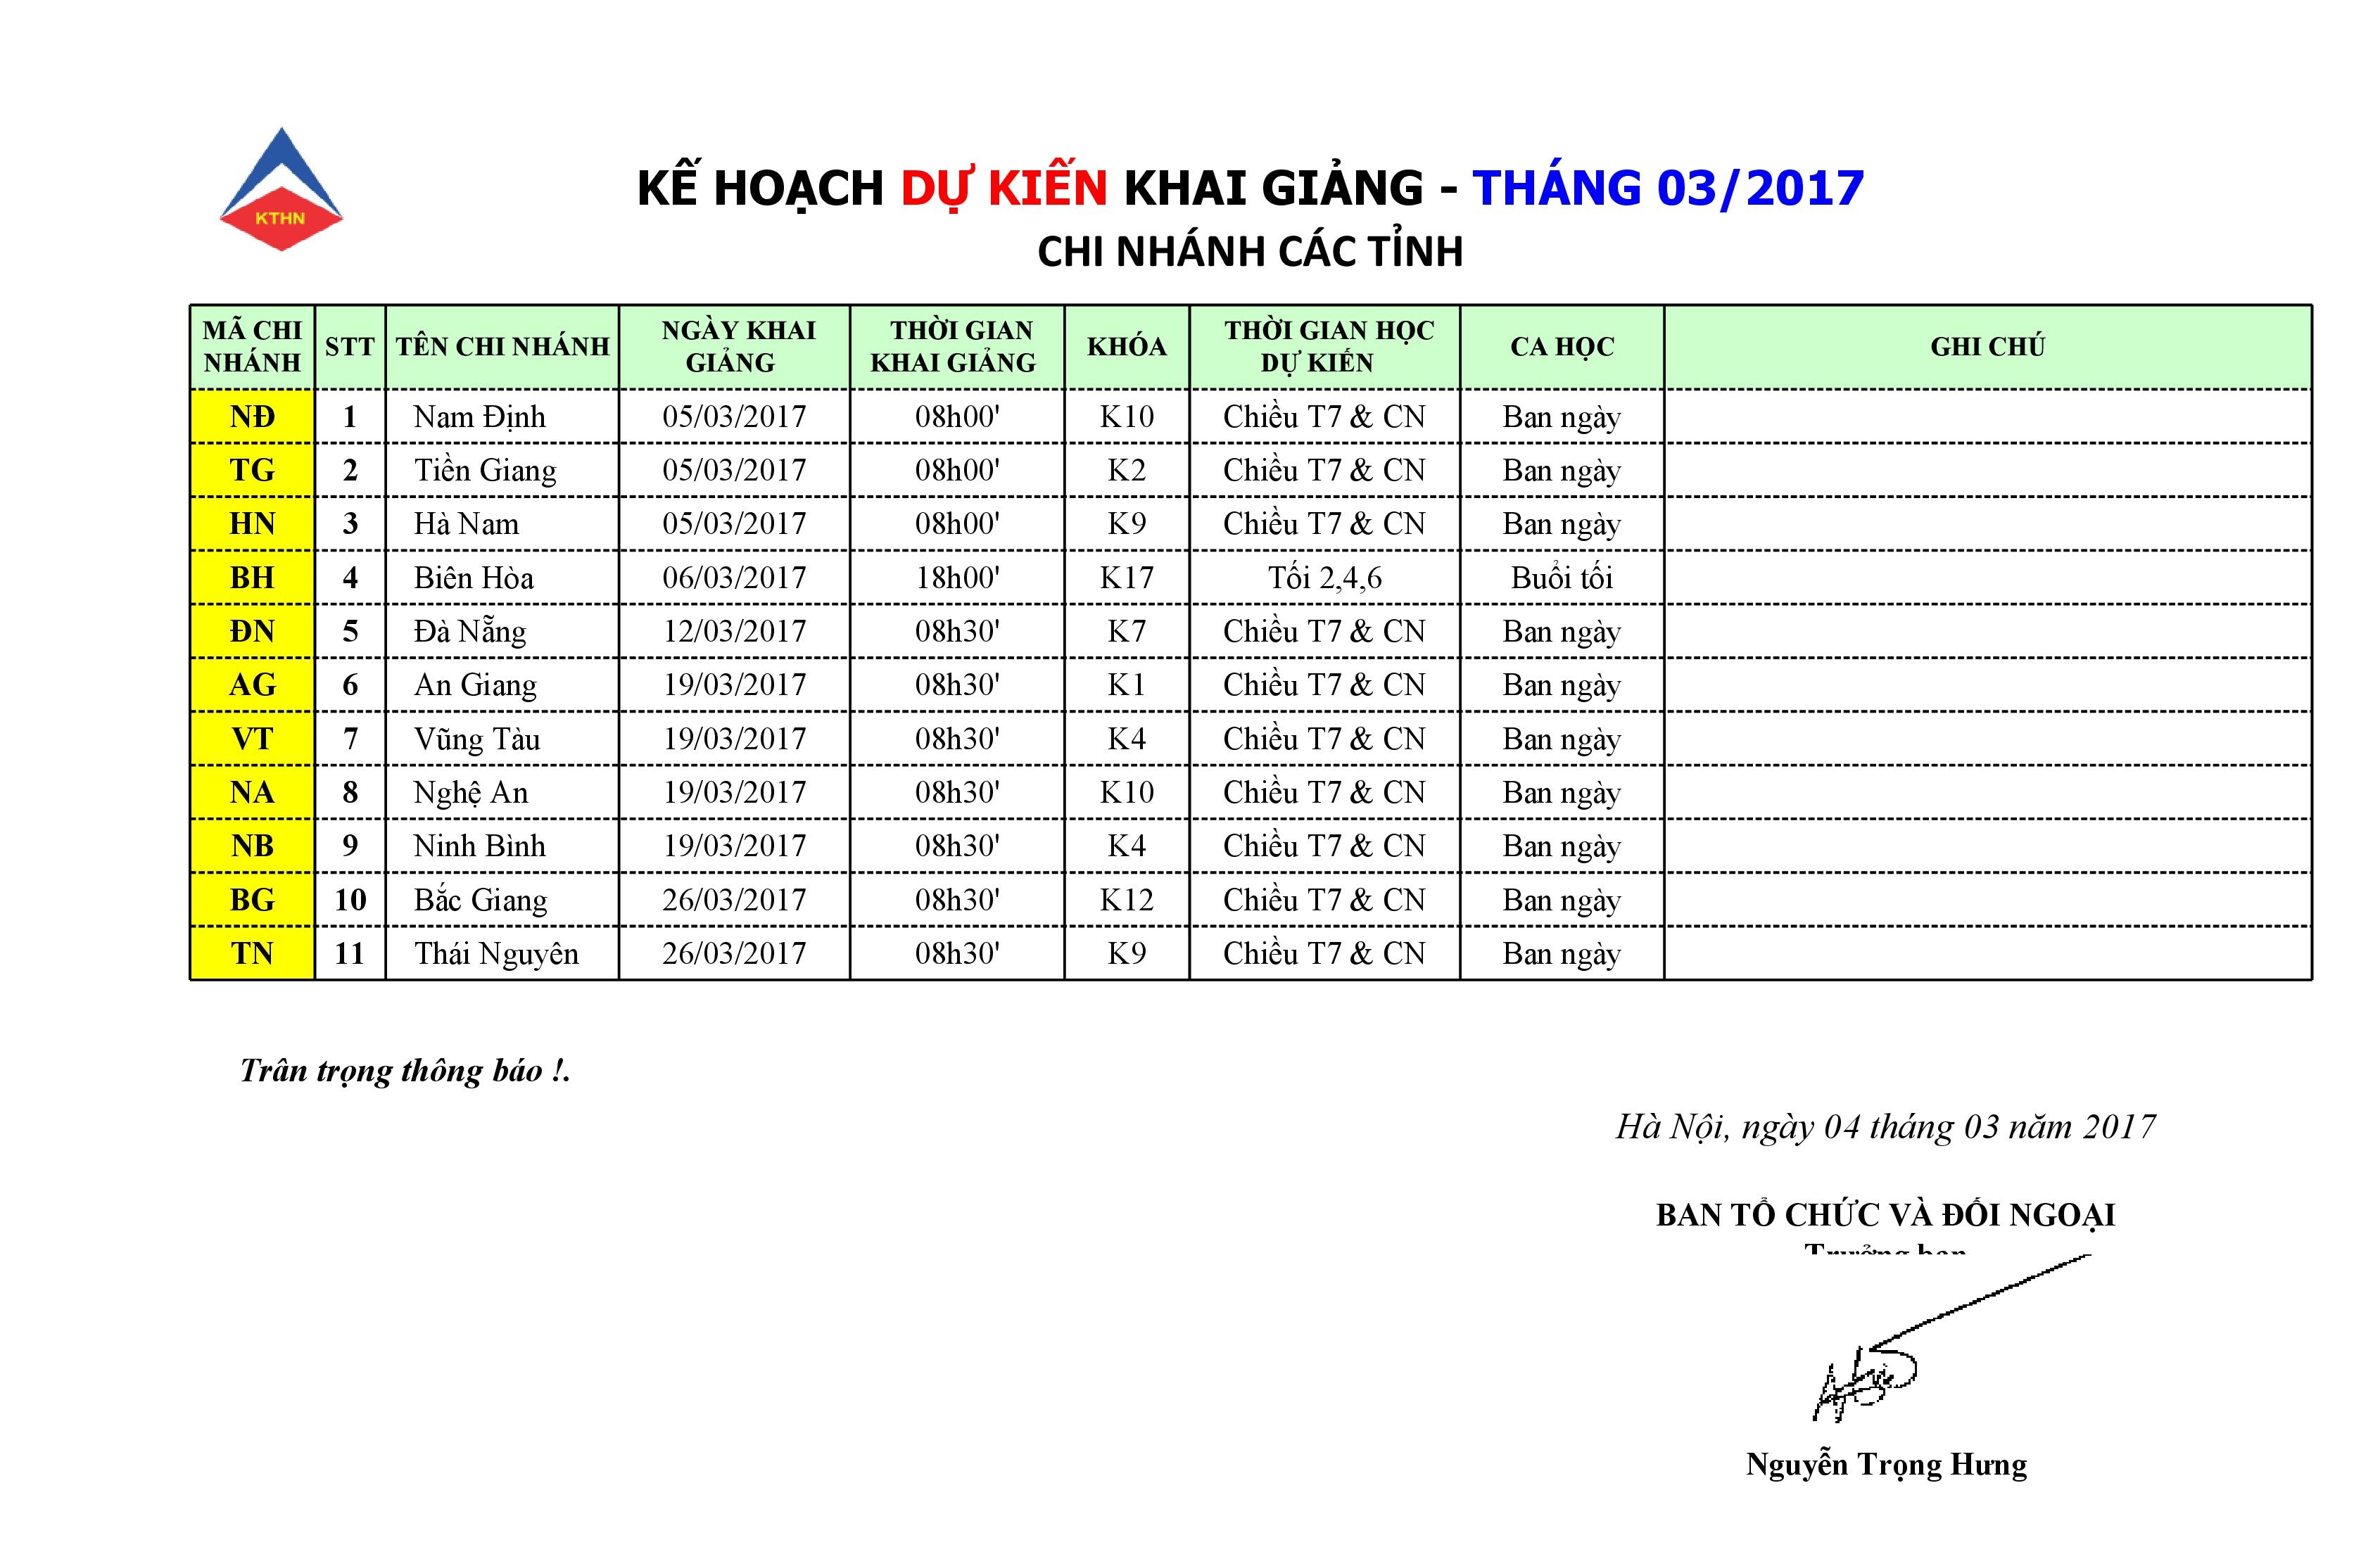 lich-kg-thang-03-2017-tai-cac-tinh